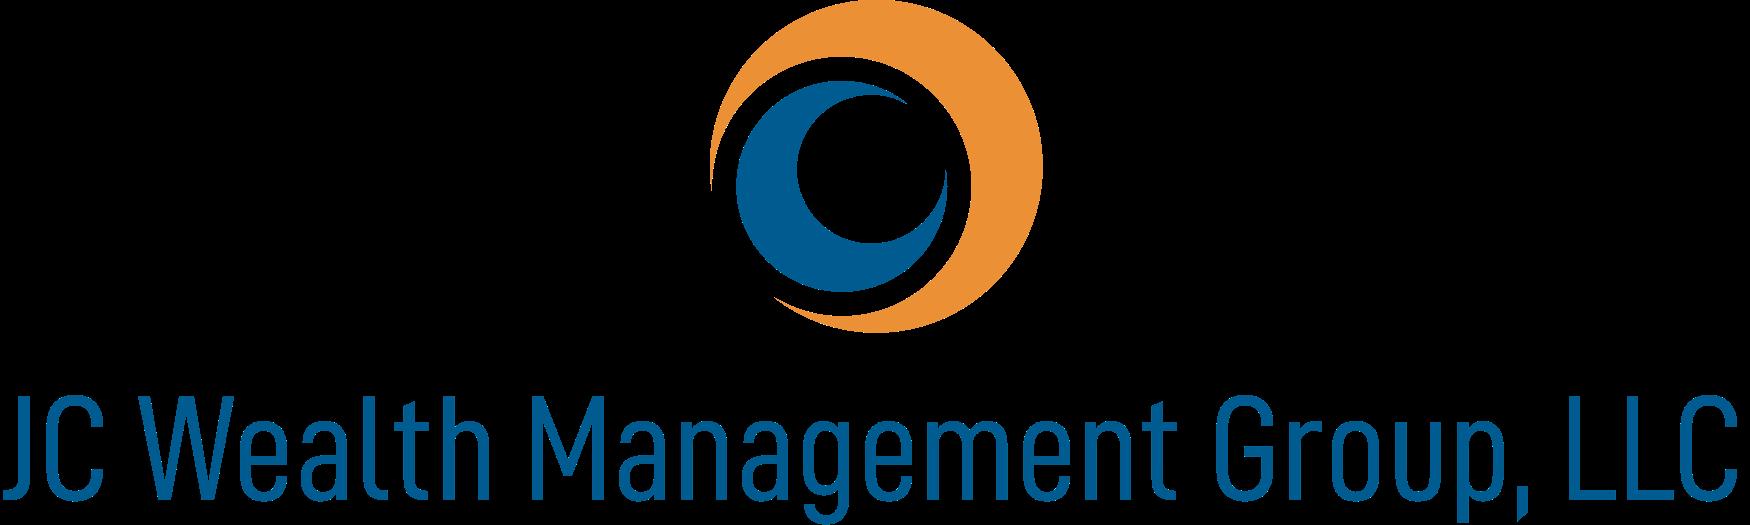 Logo for JC Wealth Management Group